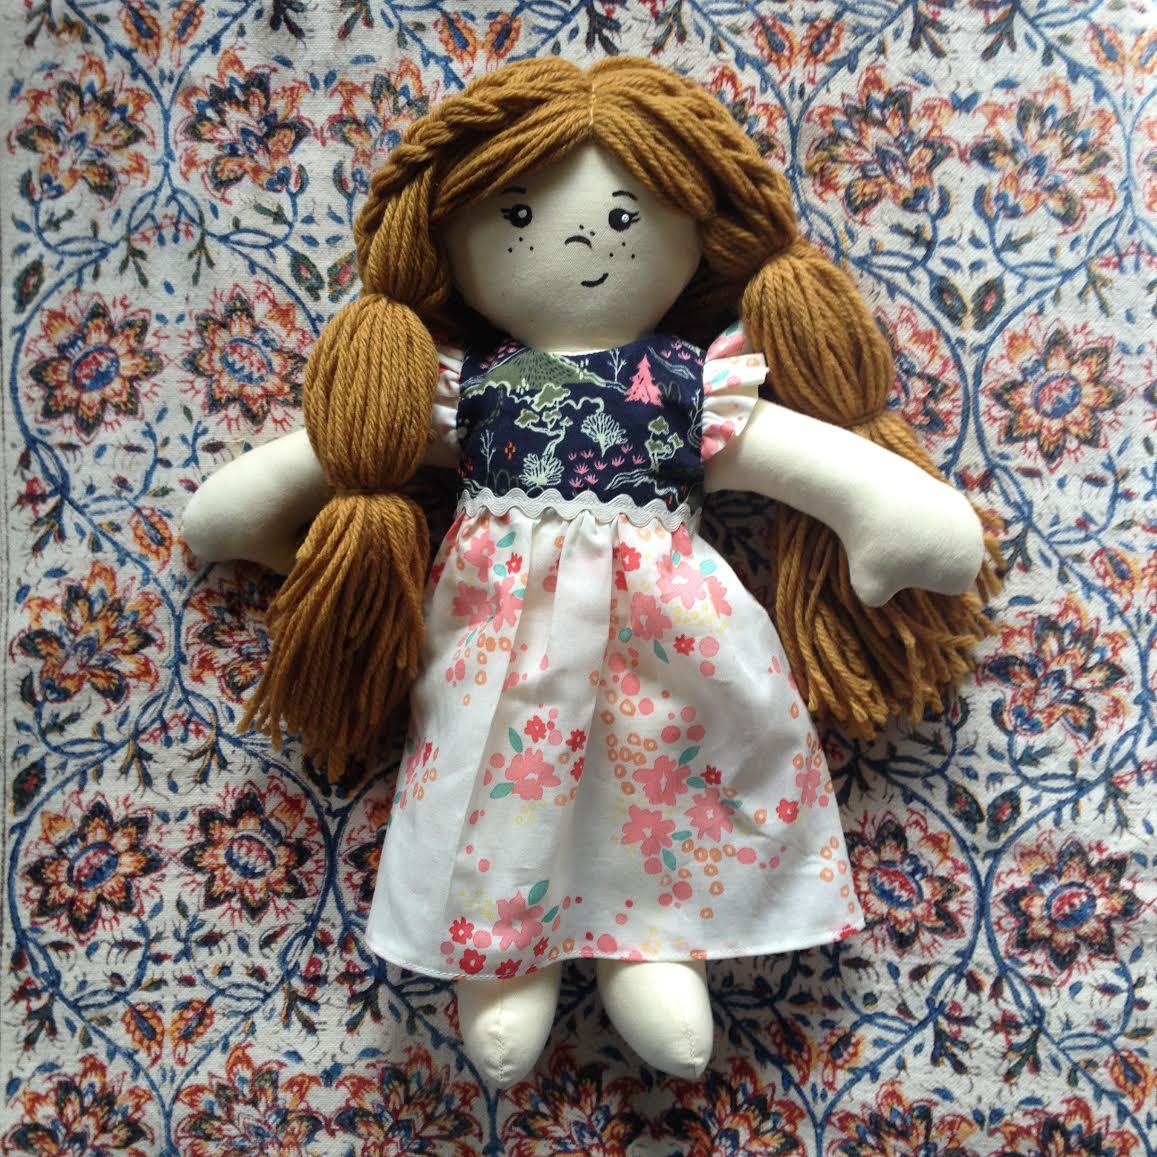 Bonmoth Doll 2